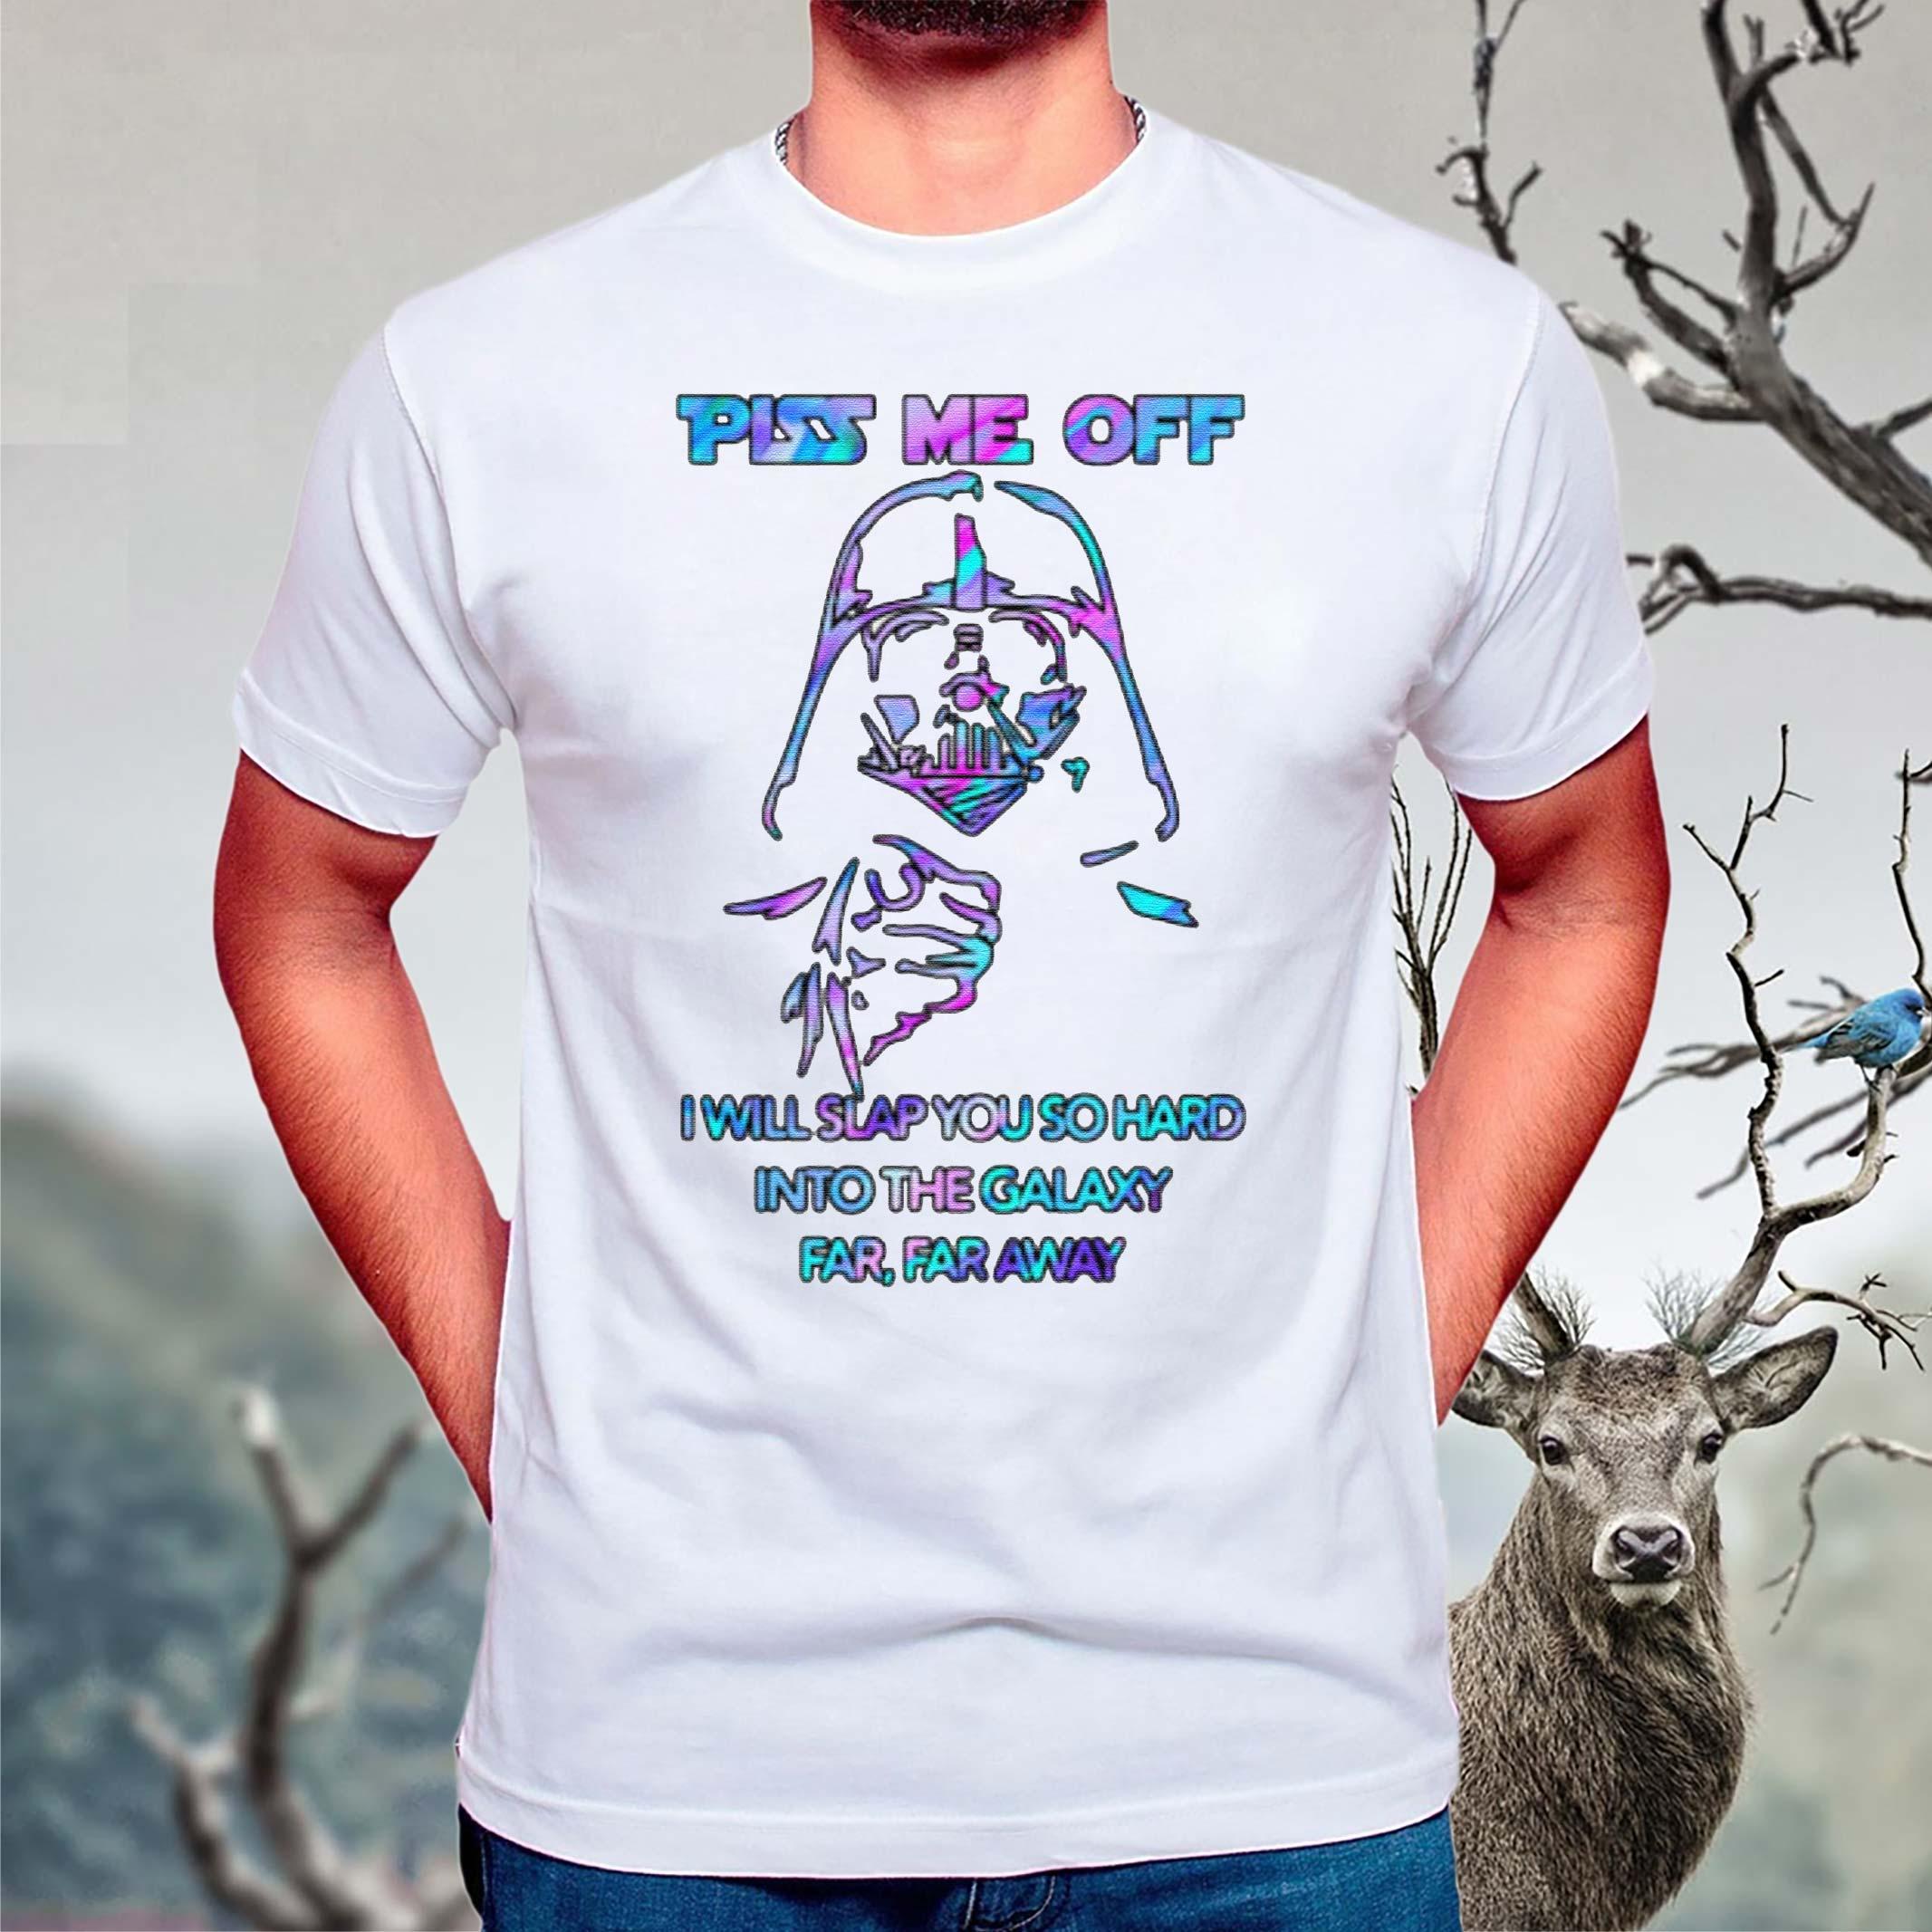 Piss-Me-Off-I-Will-Slap-You-So-Hard-Into-The-Galaxy-Far,-Far-Away-T-Shirts